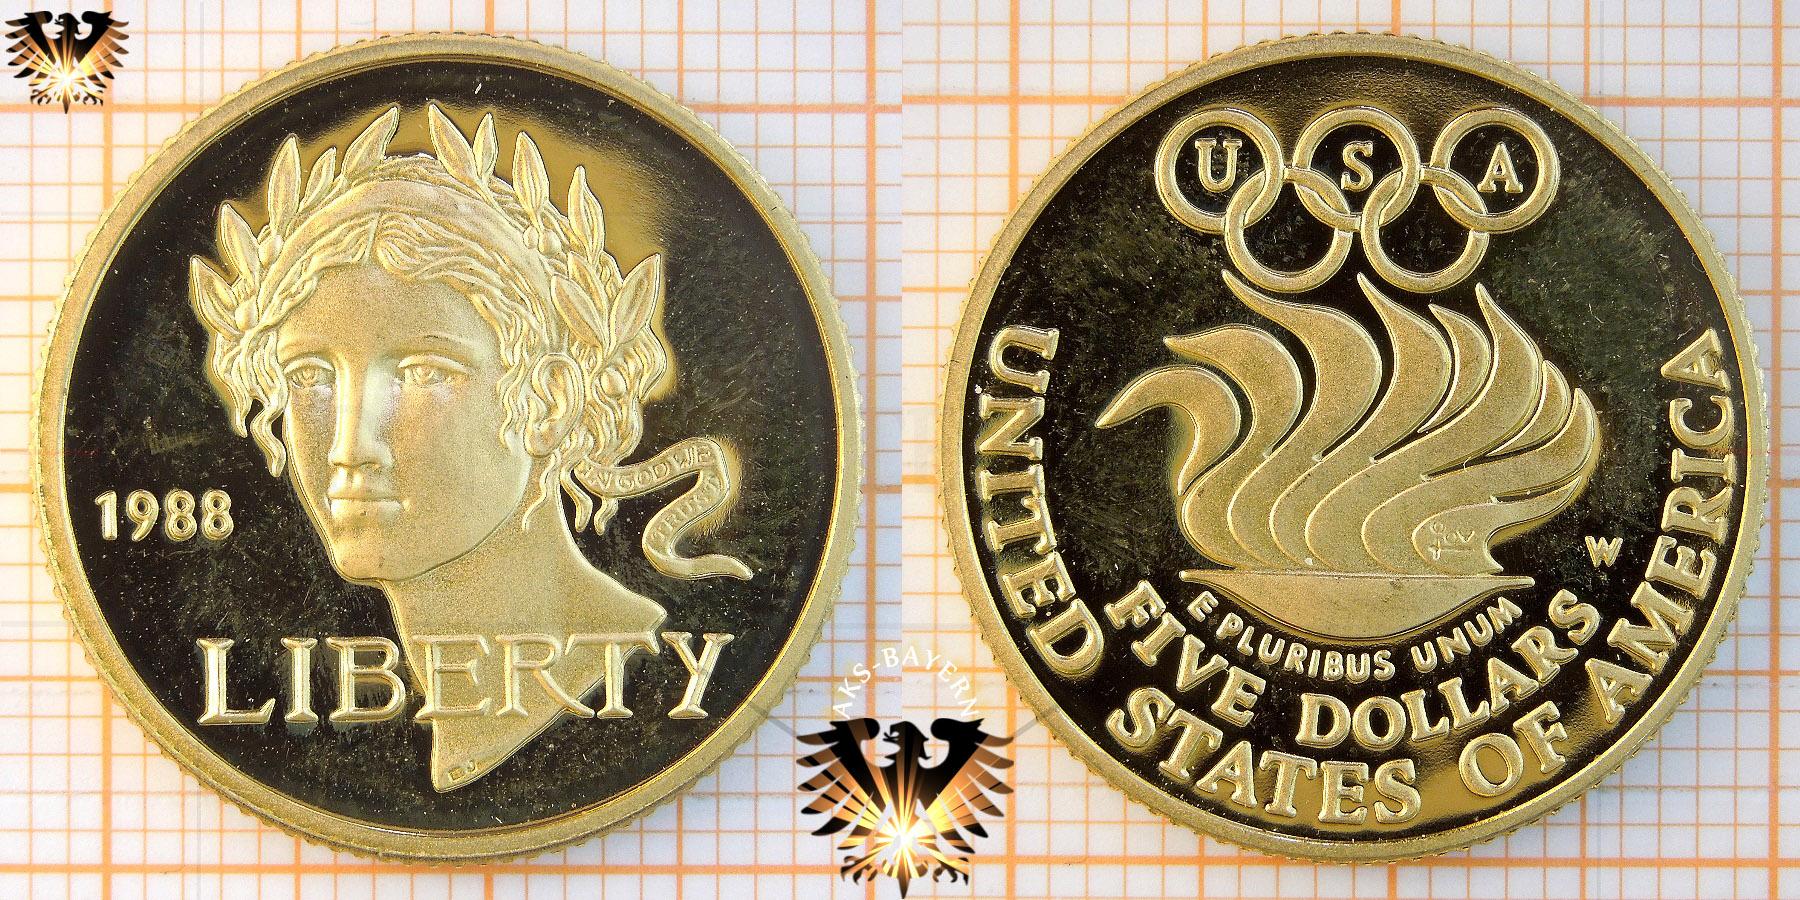 $5 Dollars, USA, 1988 W, Olympics, Liberty, Half Eagle Goldmünze © goldankaufstelle-bayern.de